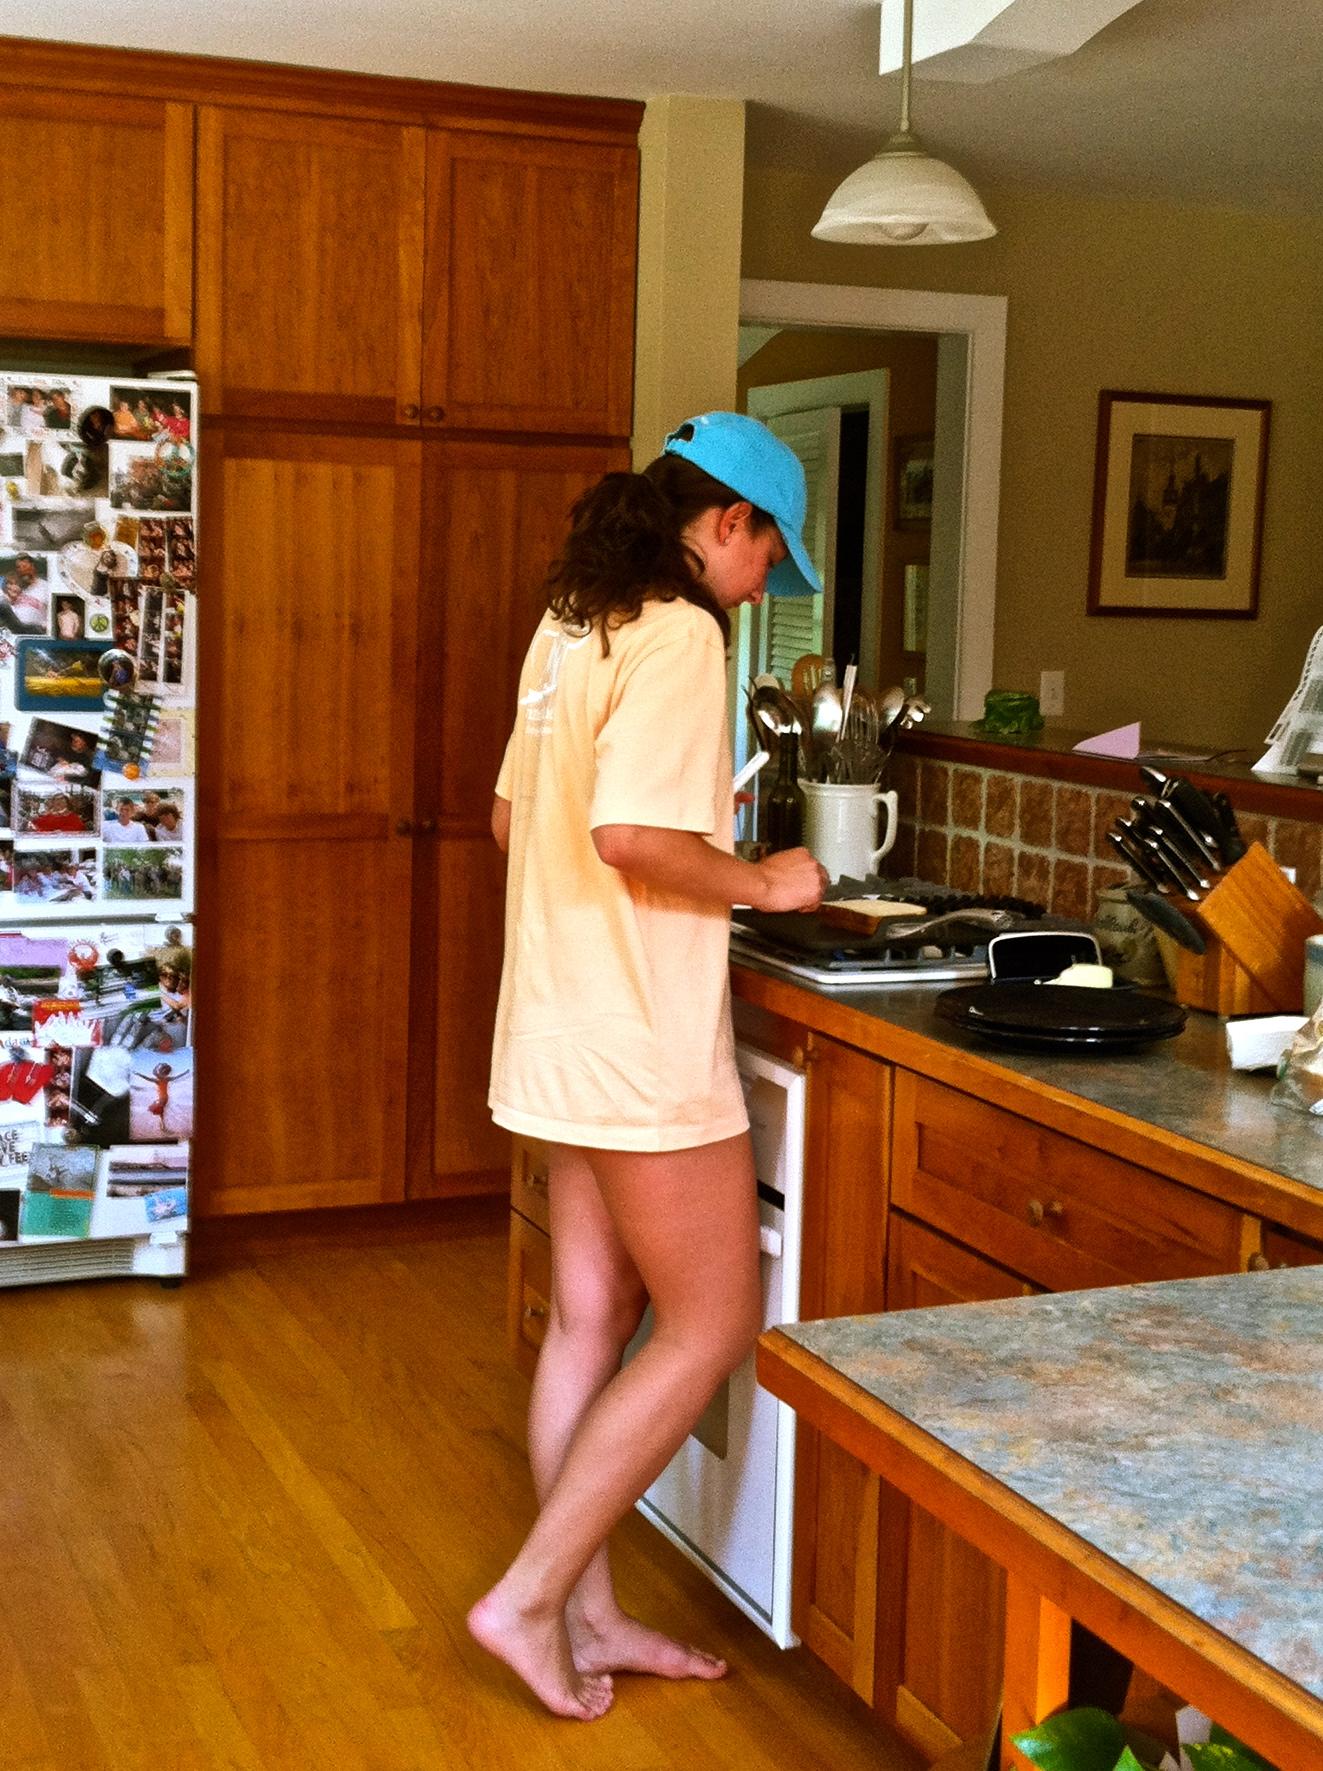 Cooking in a Vineyard Vines hat, shirt, and USA bikini. TSM.